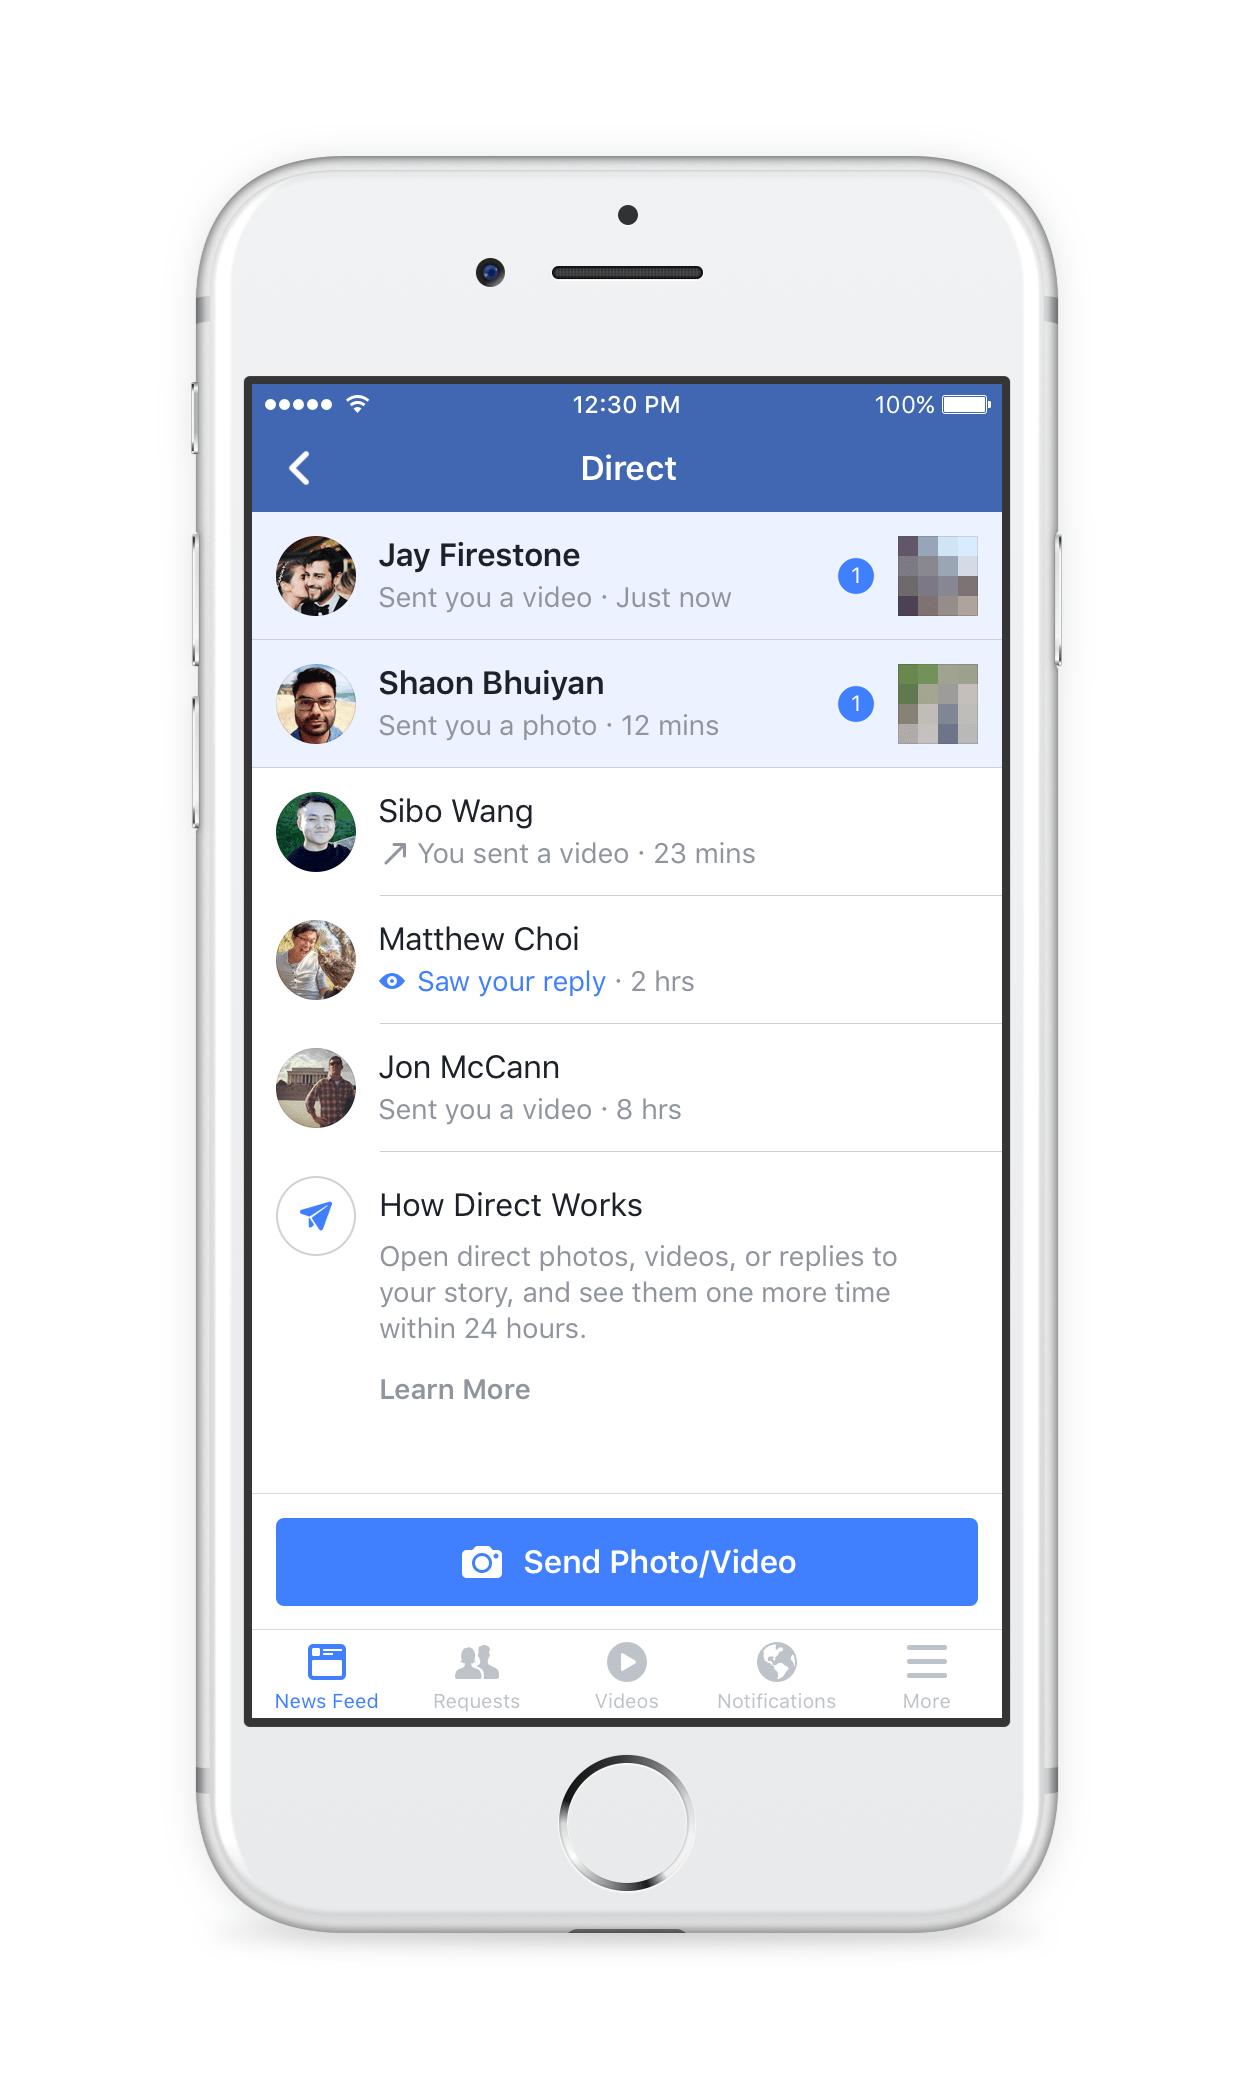 Facebook launches Stories in the main Facebook app | TechCrunch